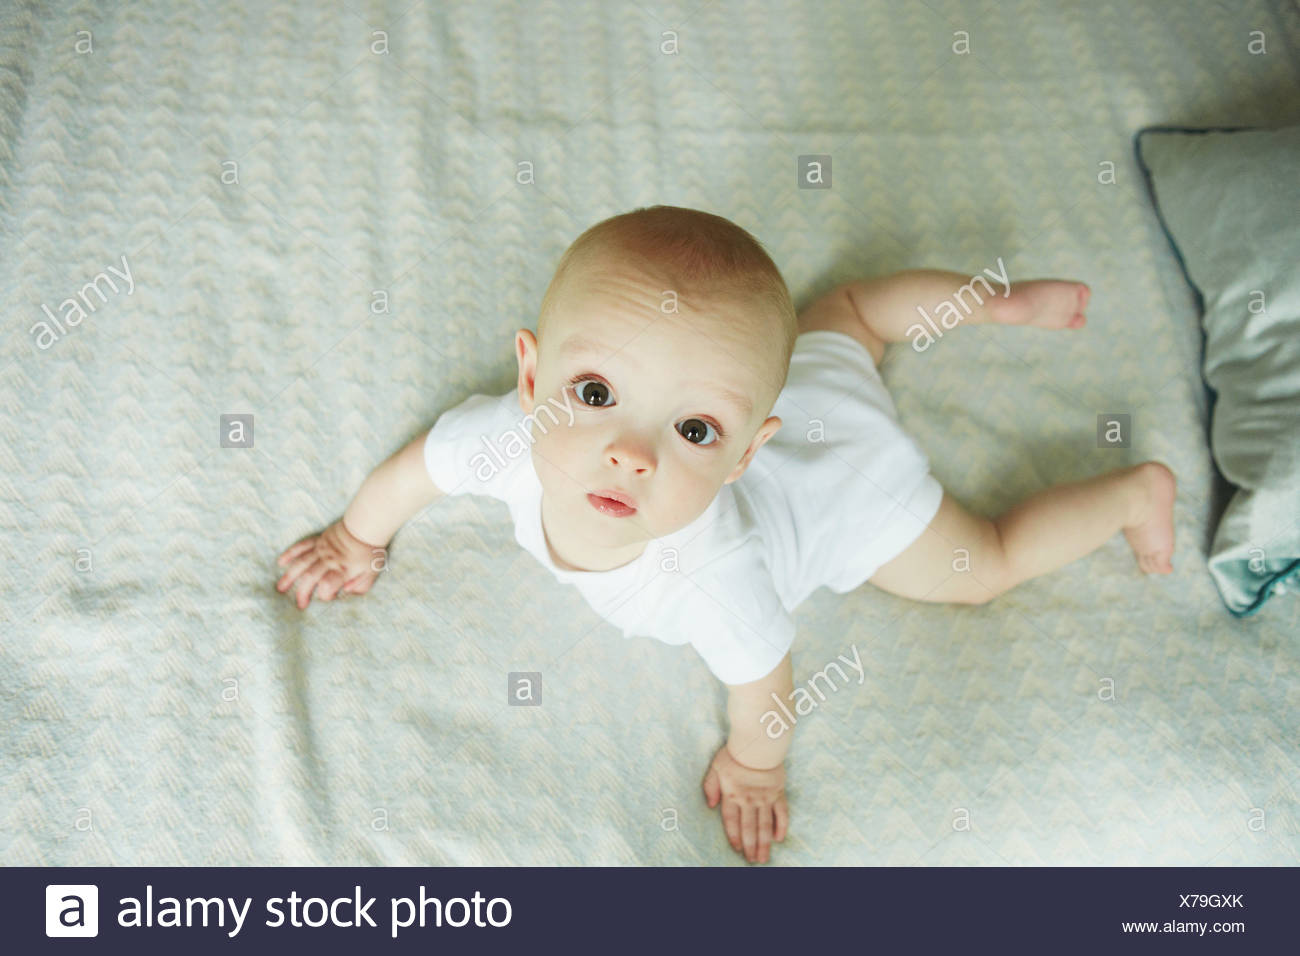 Baby Boy auf Bett kriechen Stockbild